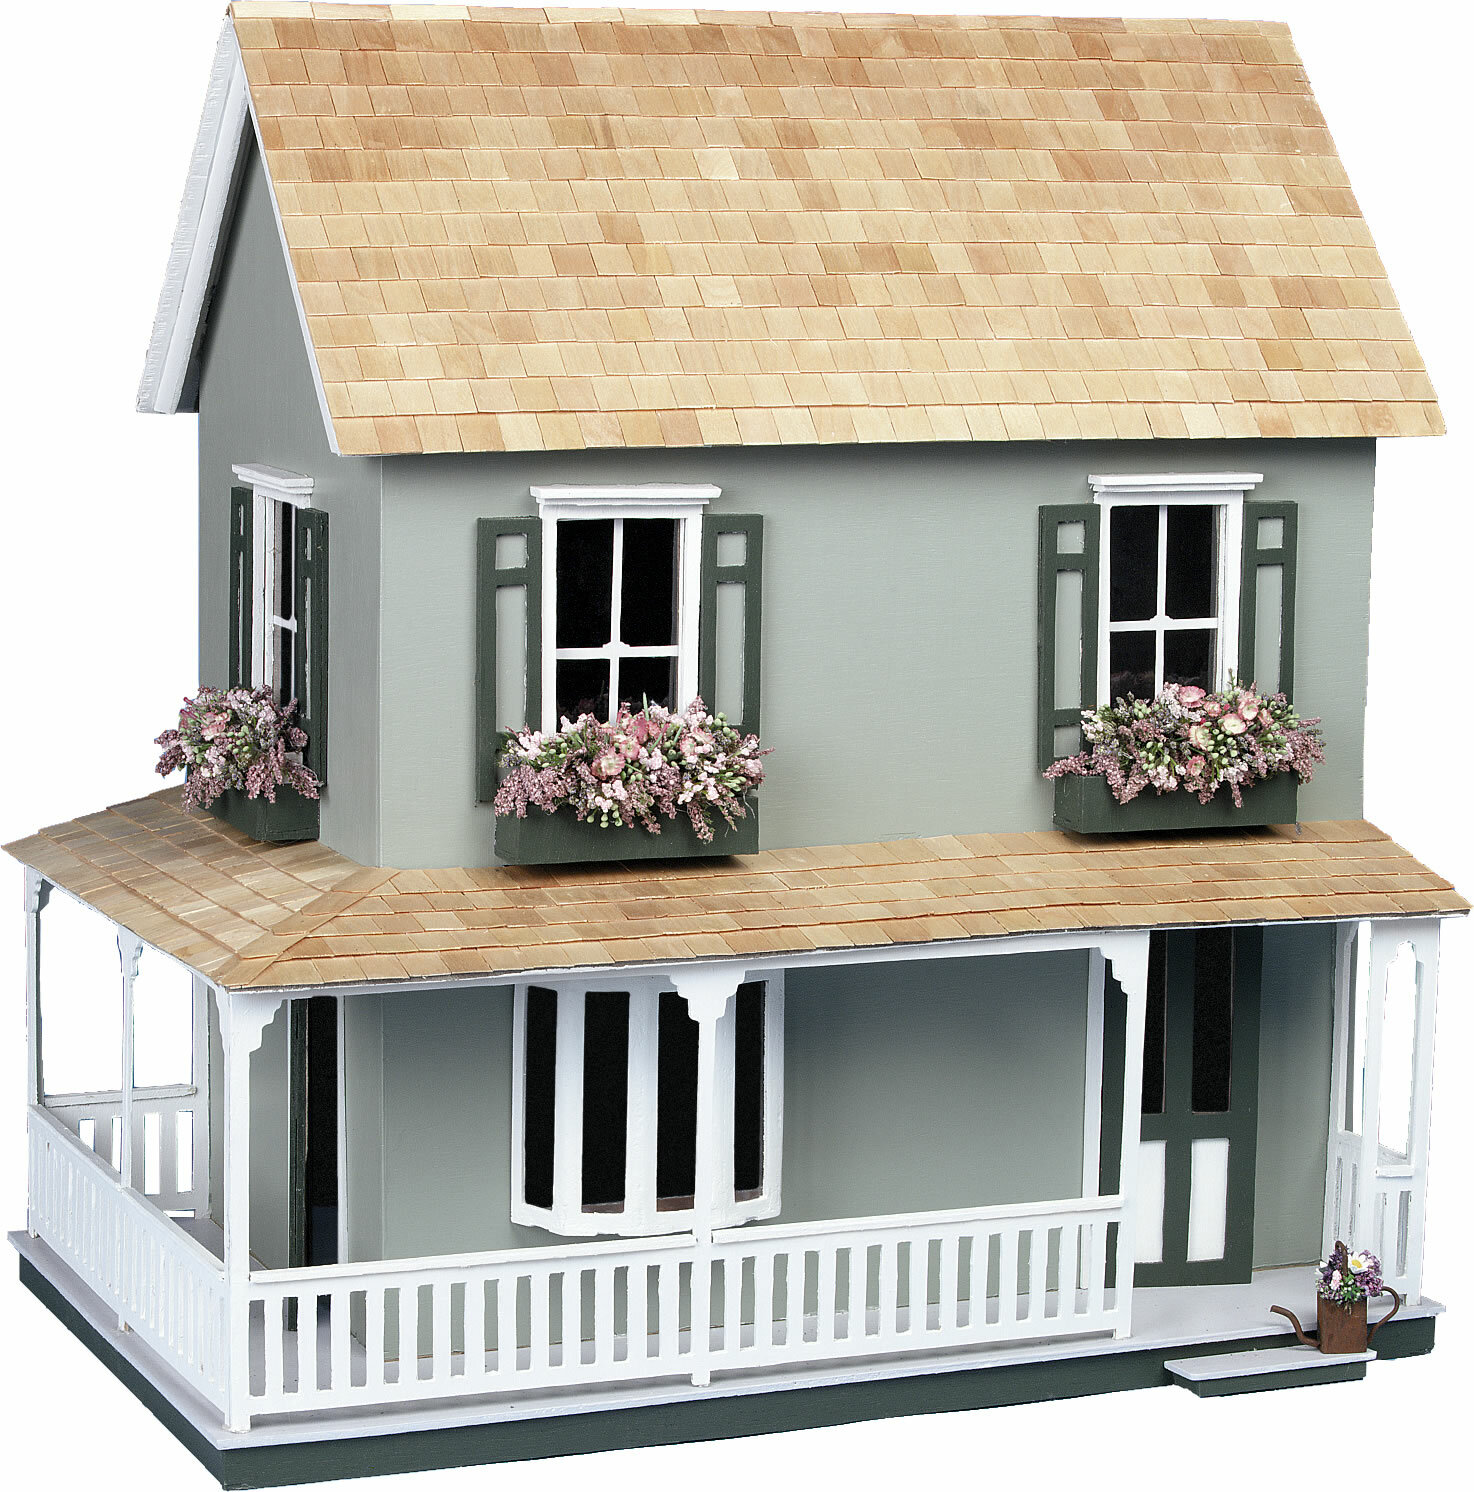 Greenleaf Dollhouses Dollhouse Laurel Kit Reviews Wayfair